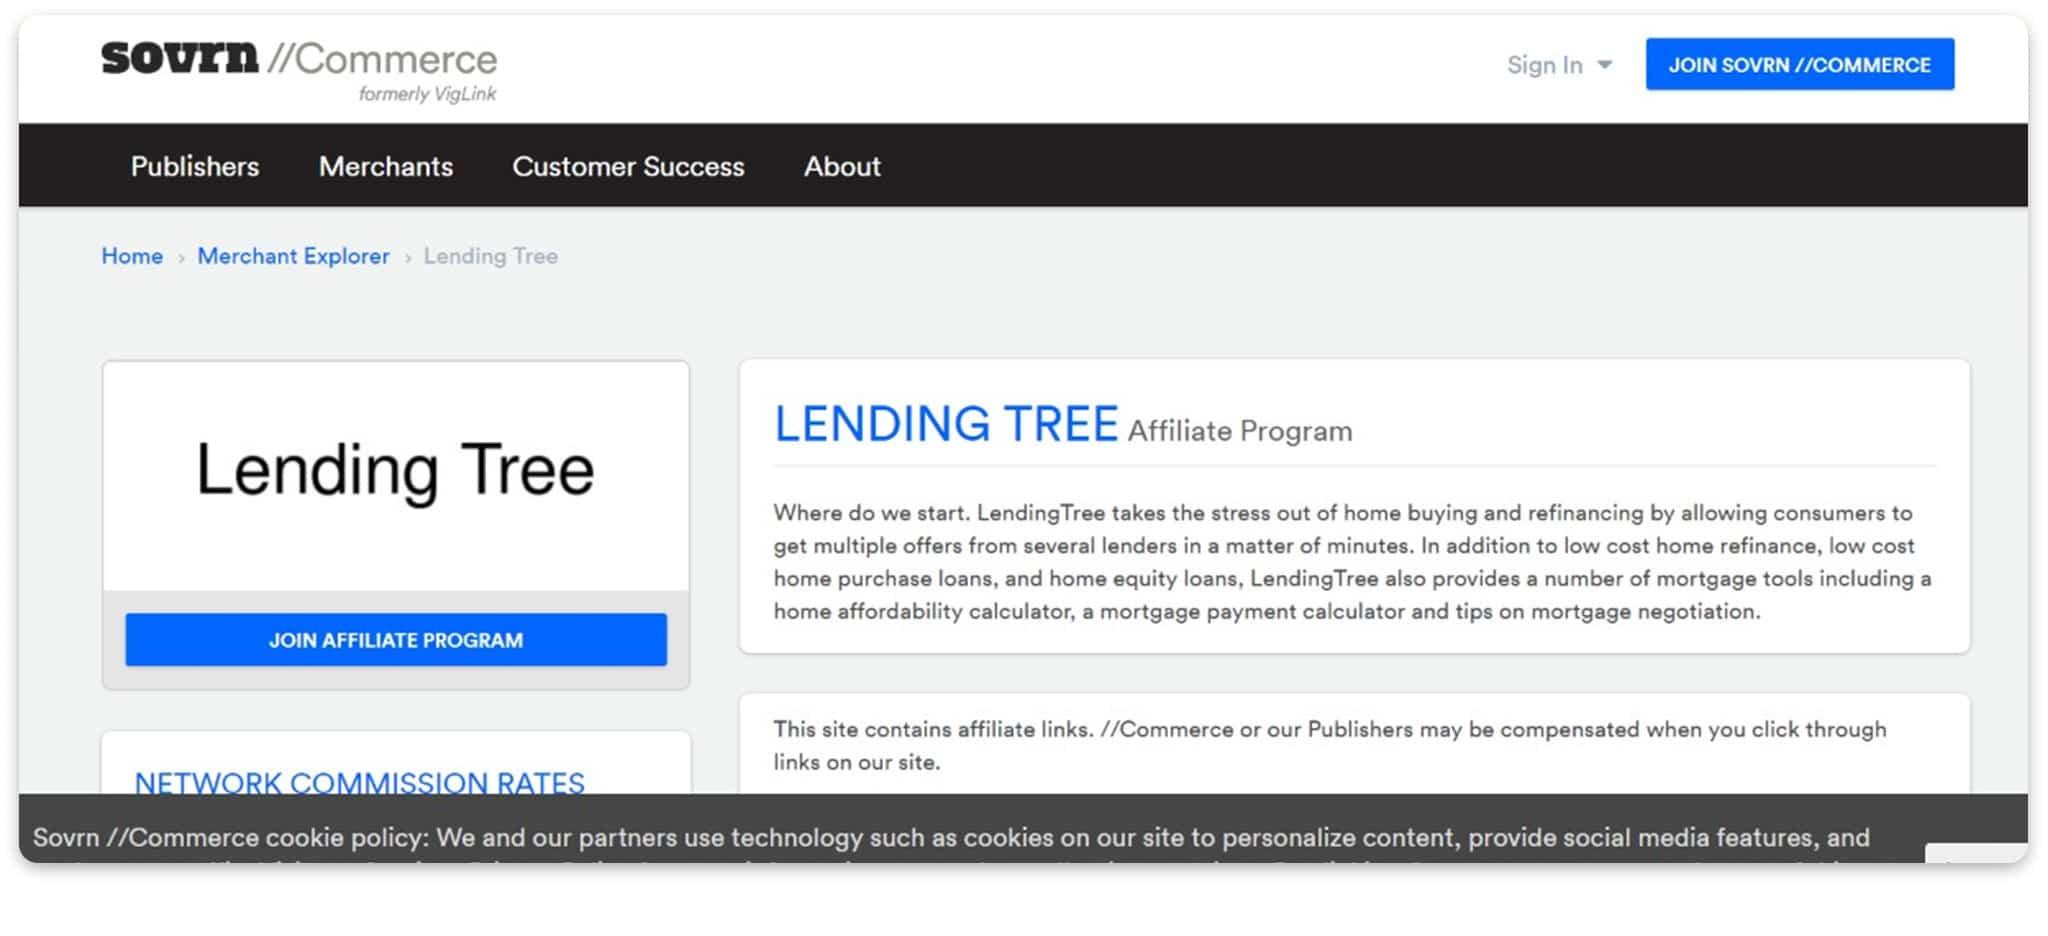 LendingTree Affiliate Program affiliate